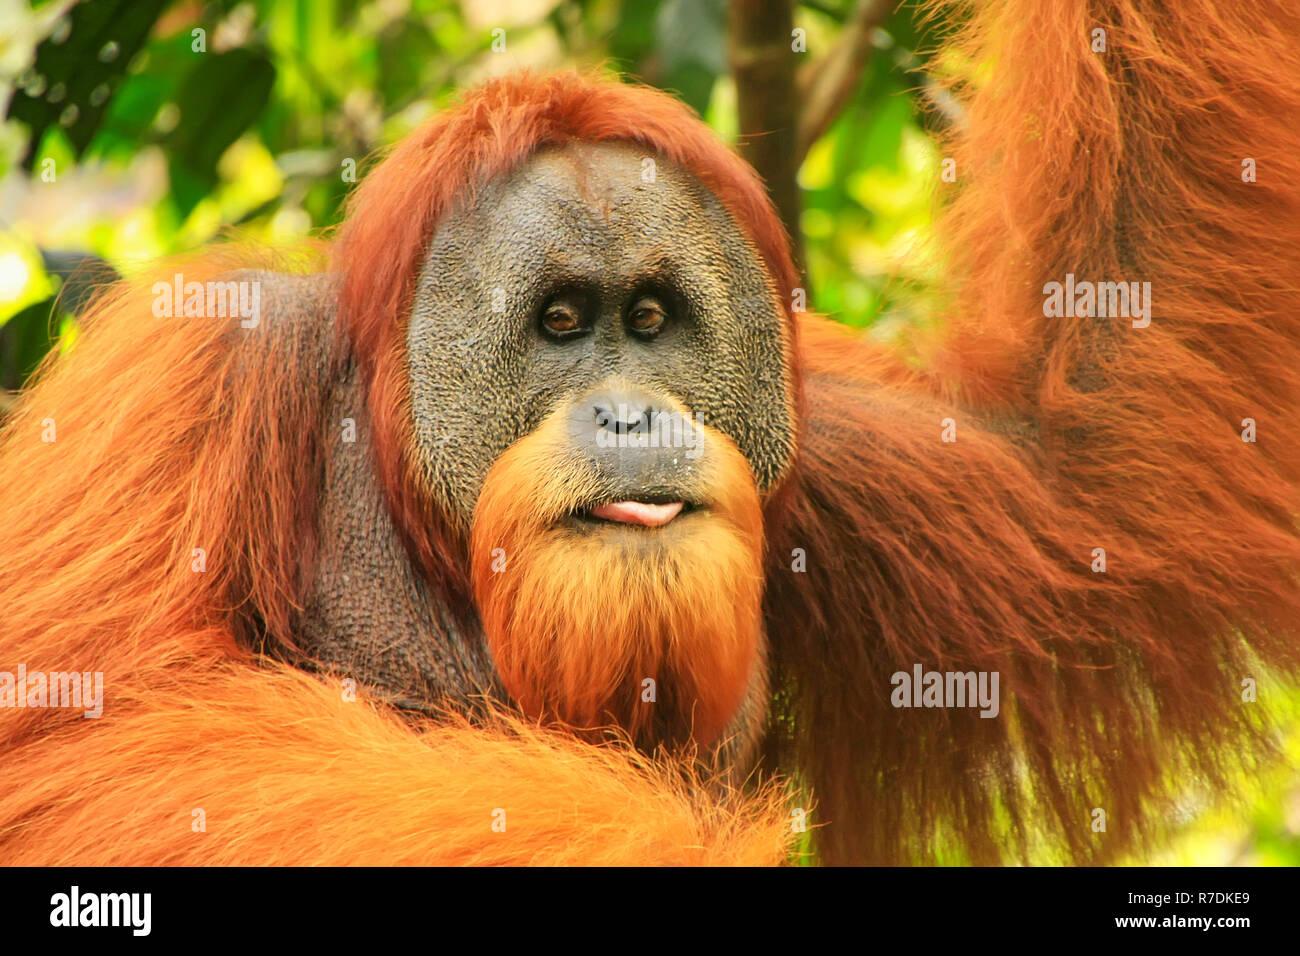 Portrait of male Sumatran orangutan (Pongo abelii) in Gunung Leuser National Park, Sumatra, Indonesia. Sumatran orangutan is endemic to the north of S Stock Photo